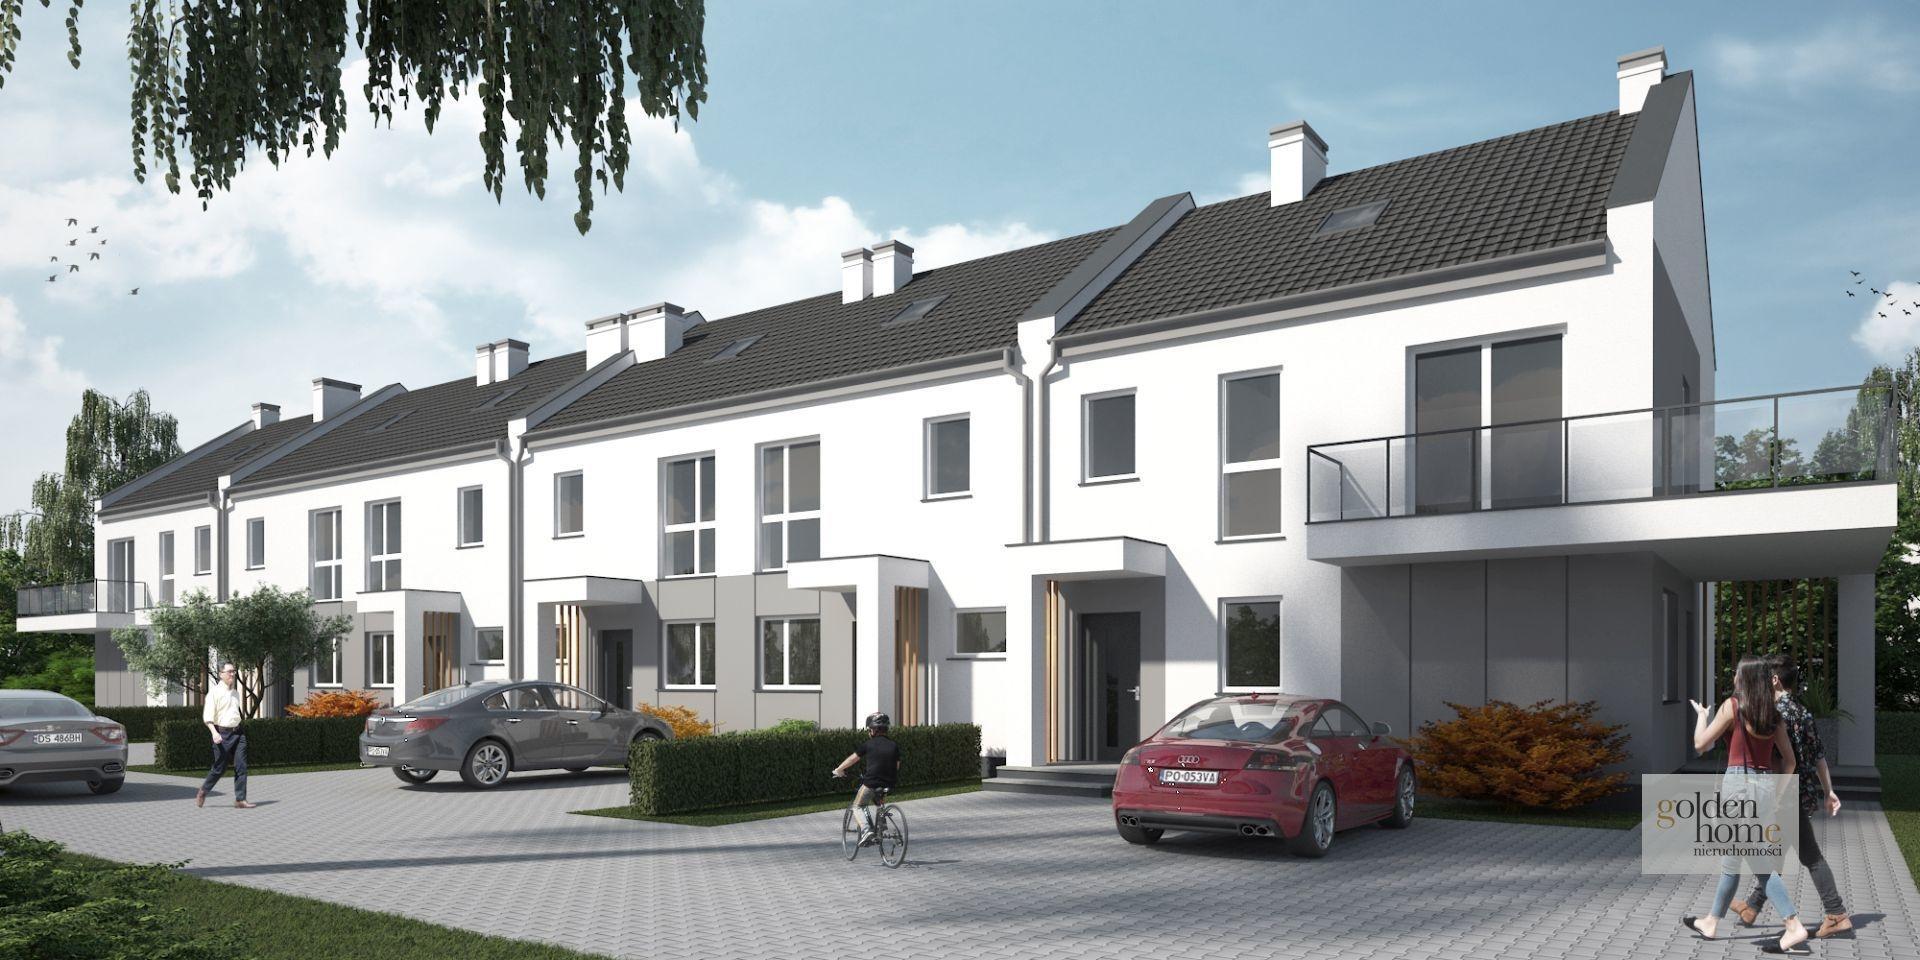 Mieszkanie Plewiska - oferta 4121